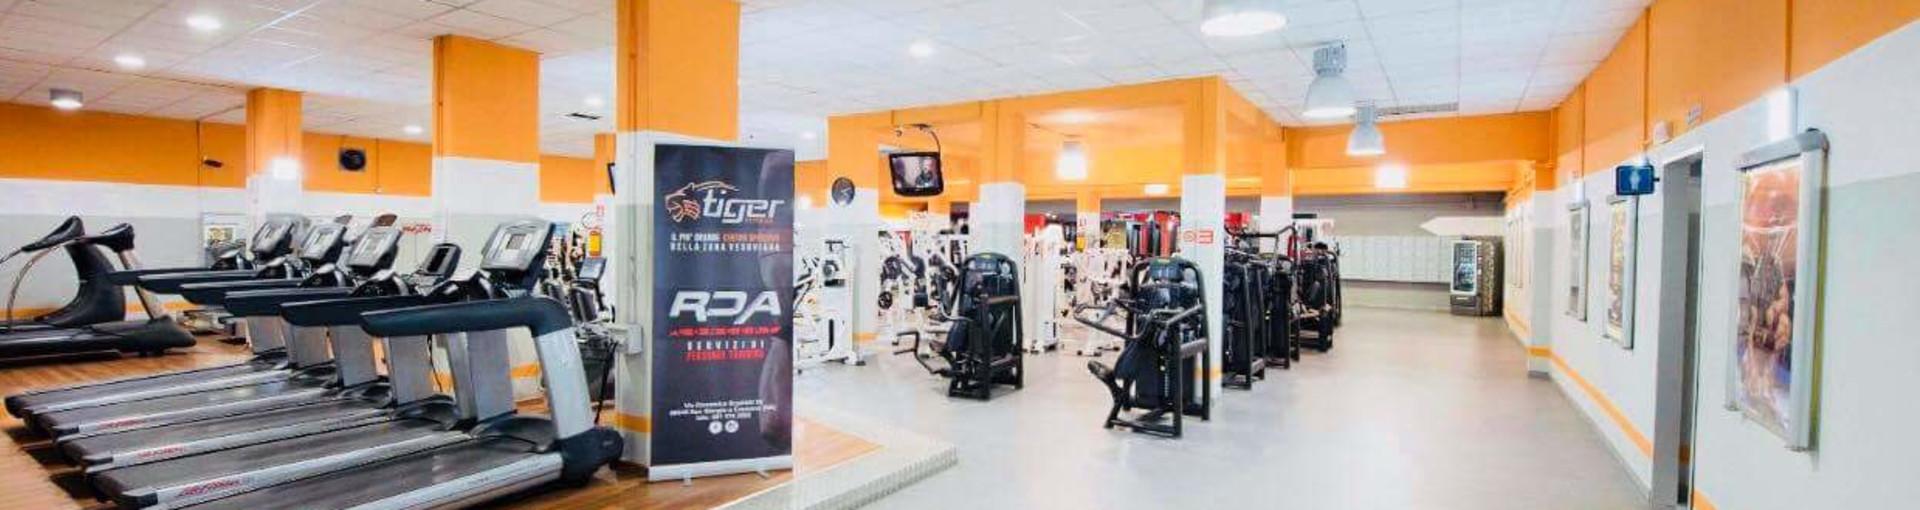 Tiger Fitness - San Giorgio a Cremano